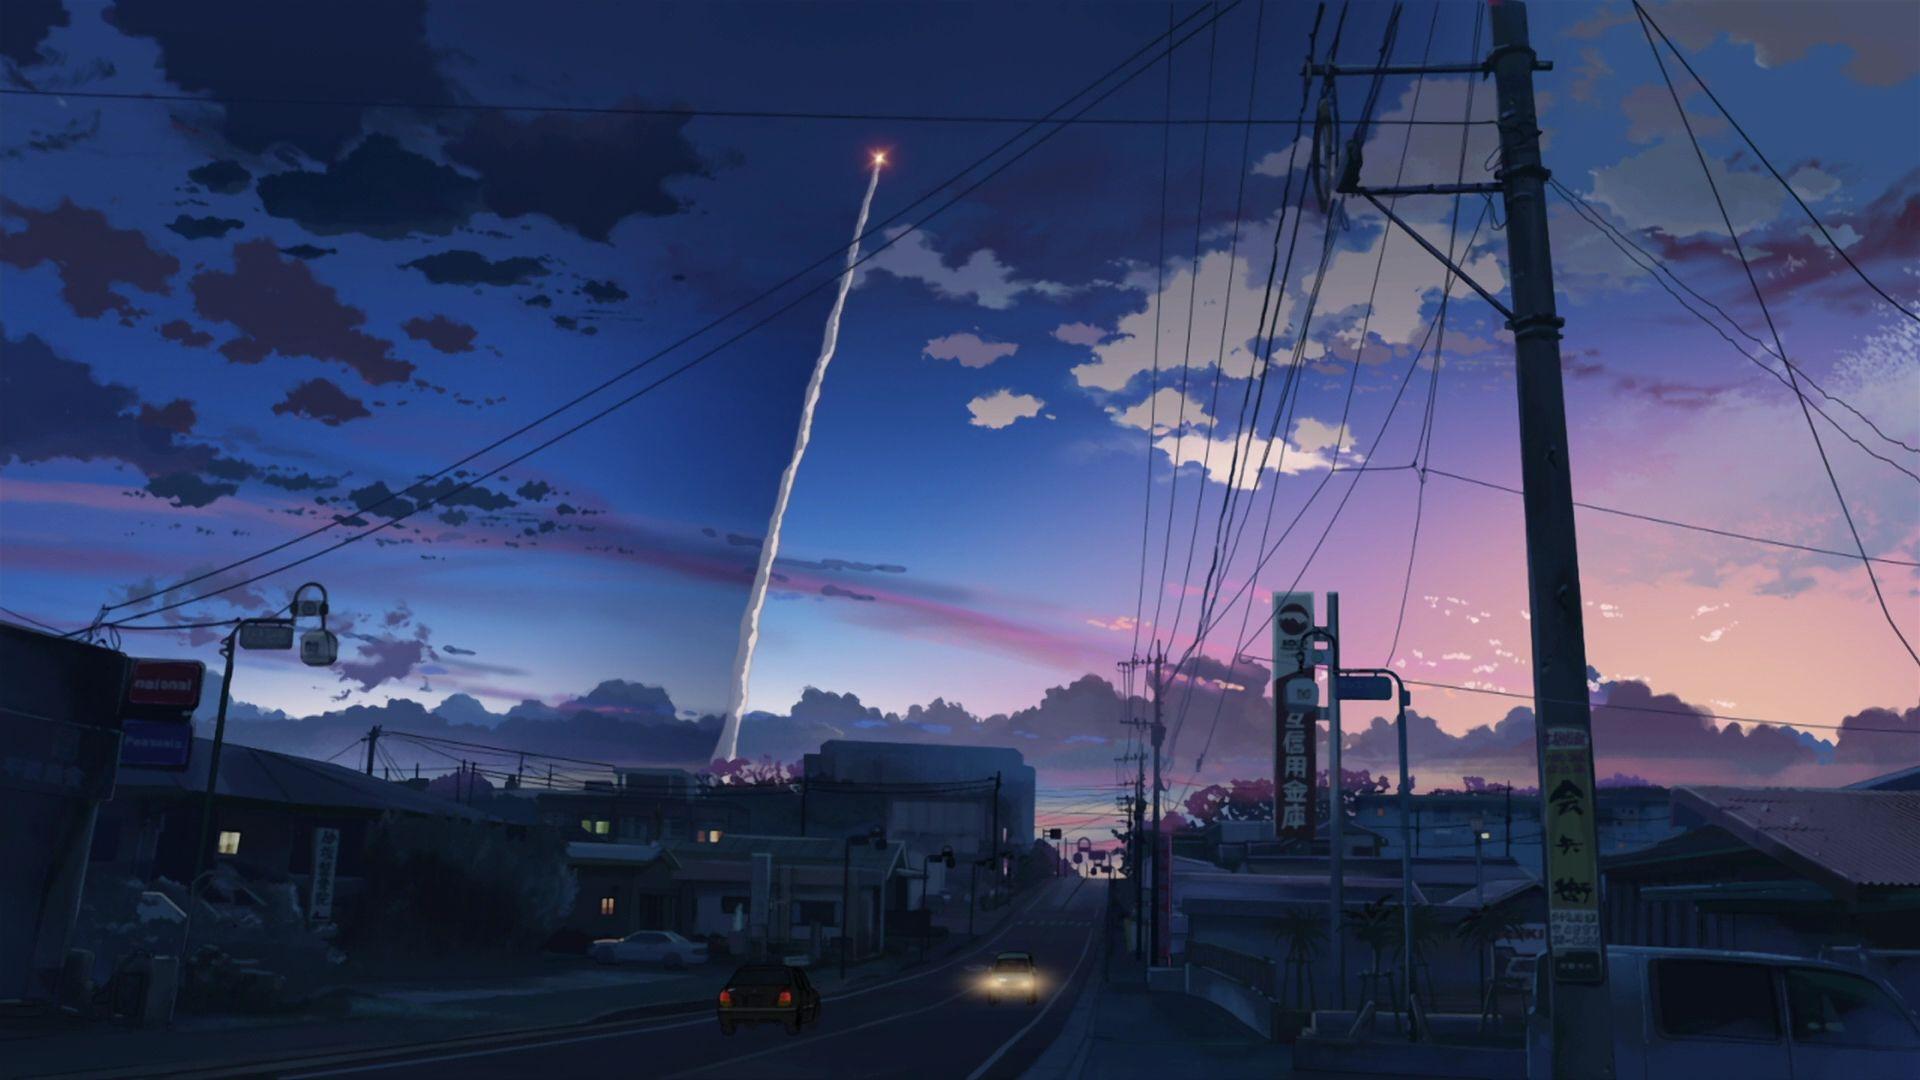 Aesthetic Anime Desktop Wallpapers   Top Aesthetic Anime 1920x1080